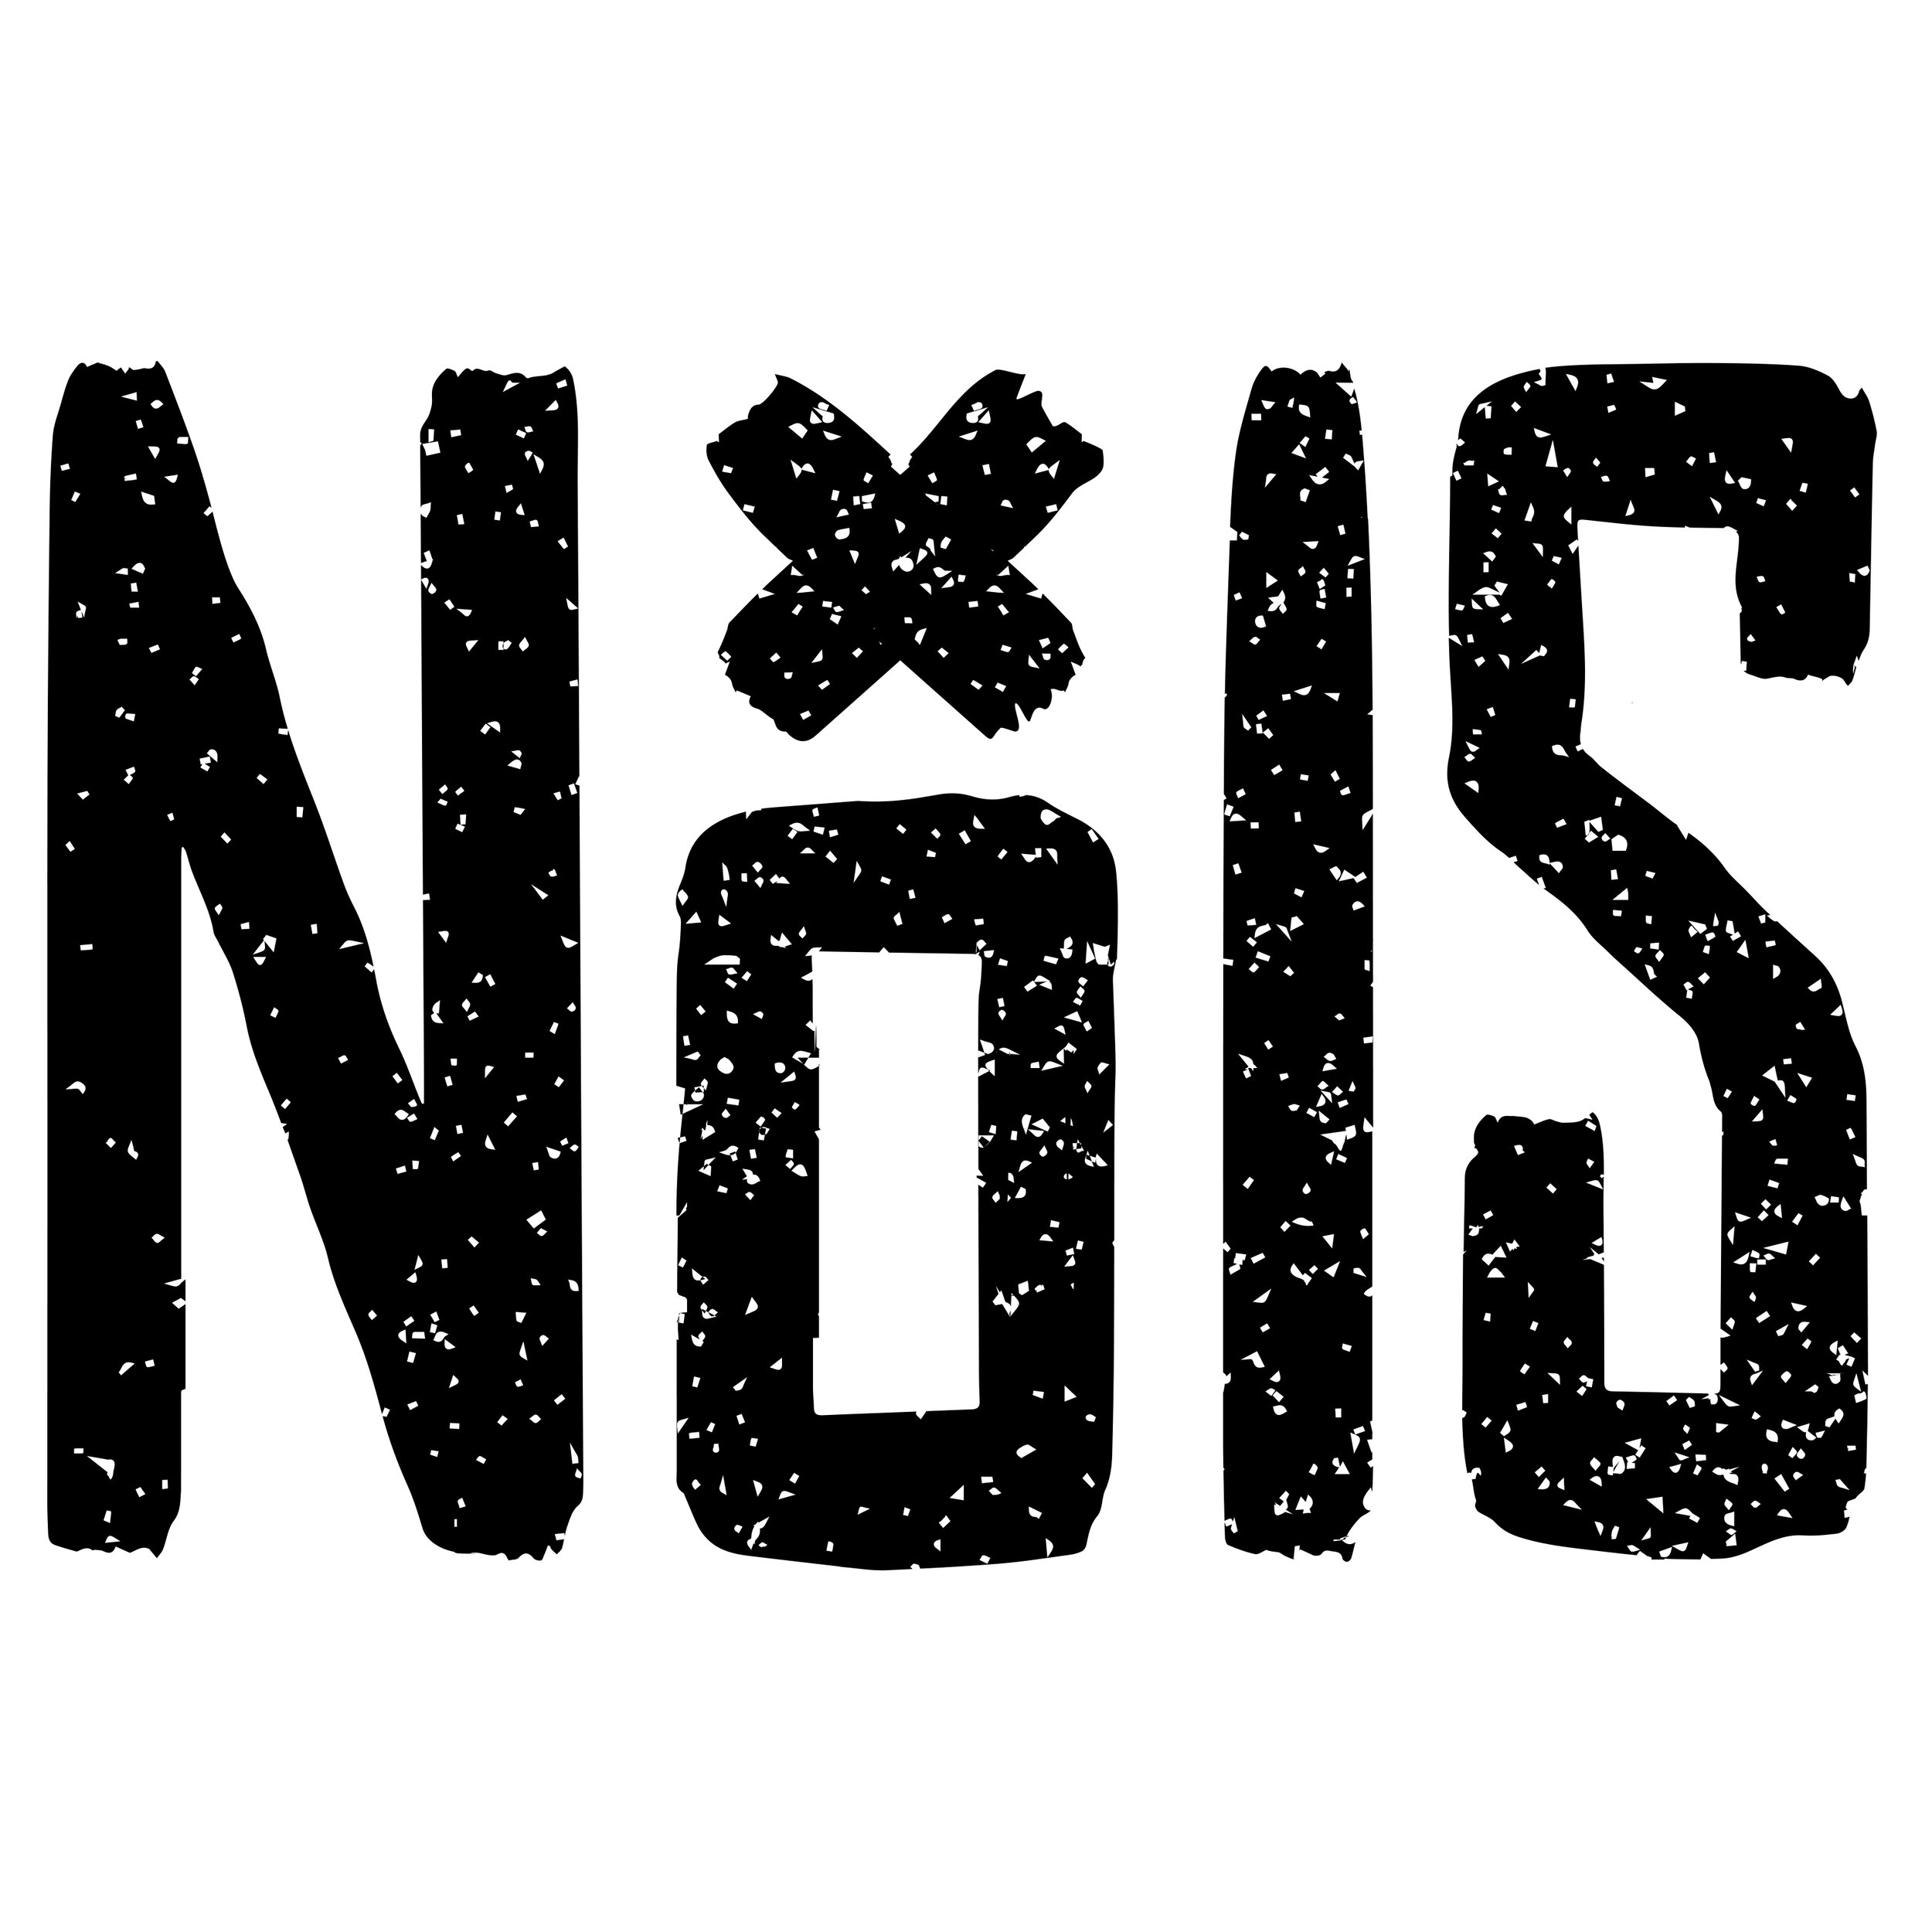 NOIX PRETO C-EFEITO (1x1).jpg